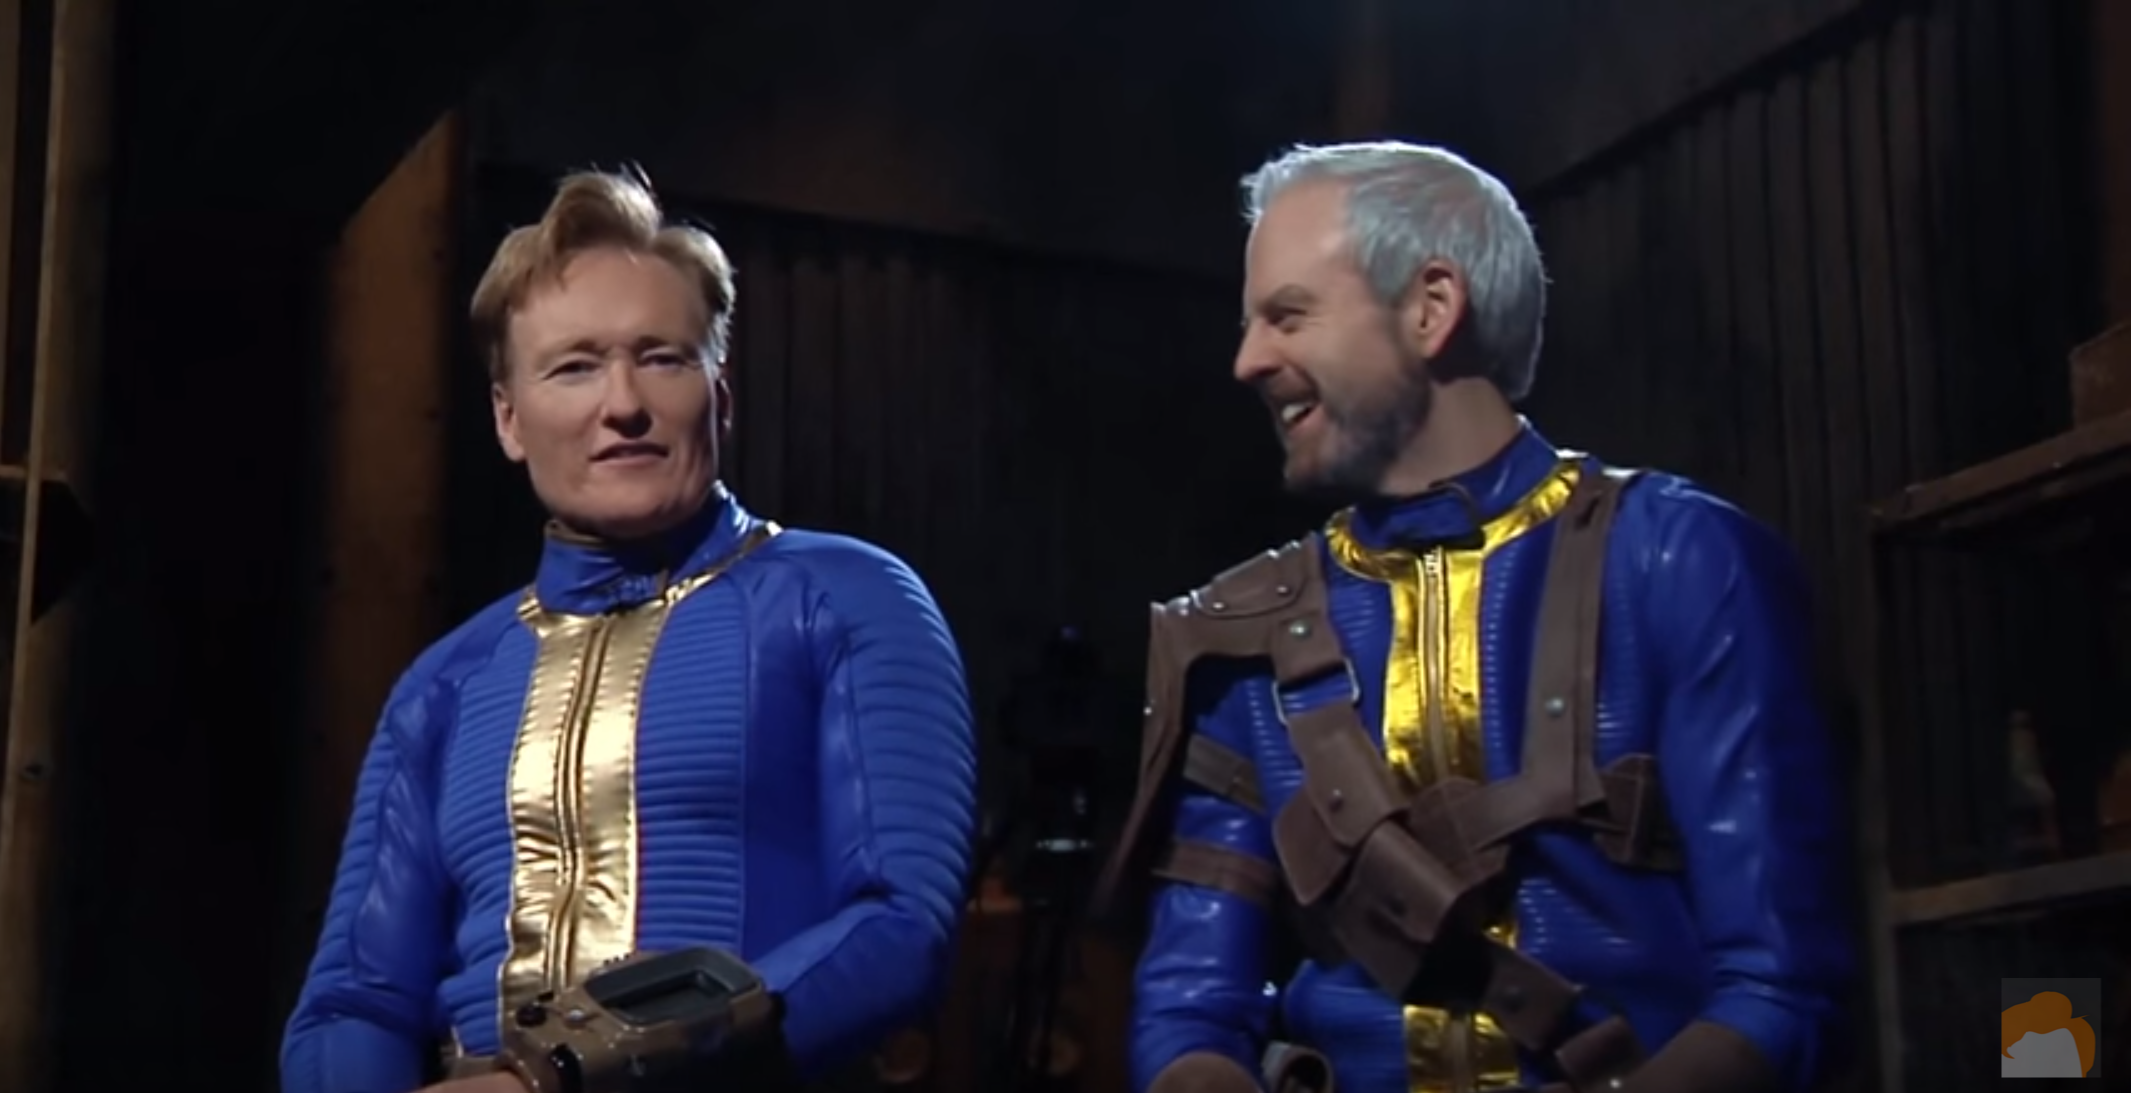 Watch Conan Play Fallout 4 In Clueless Gamer